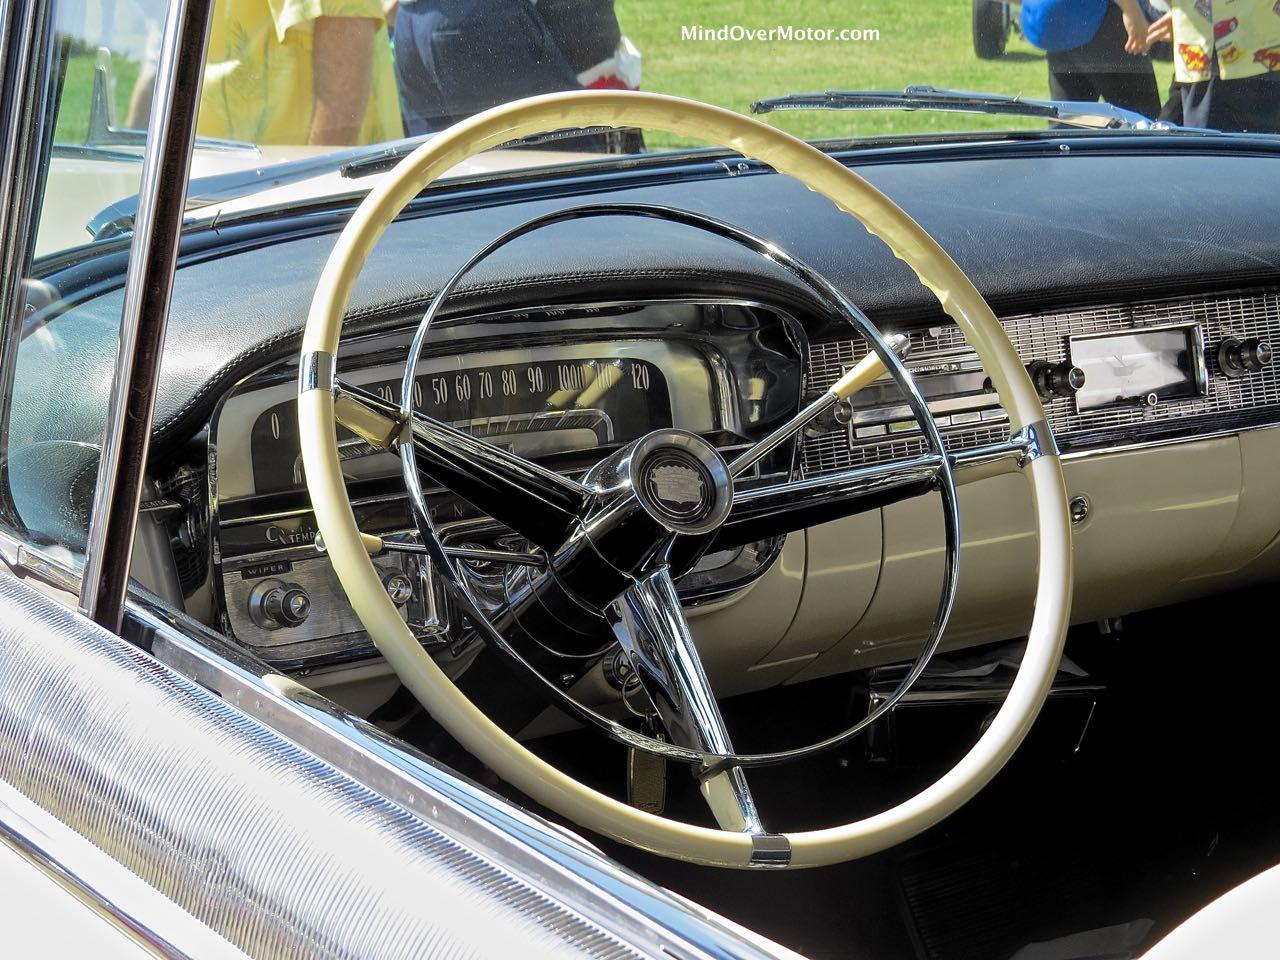 1956 Cadillac Eldorado Dashboard Detail